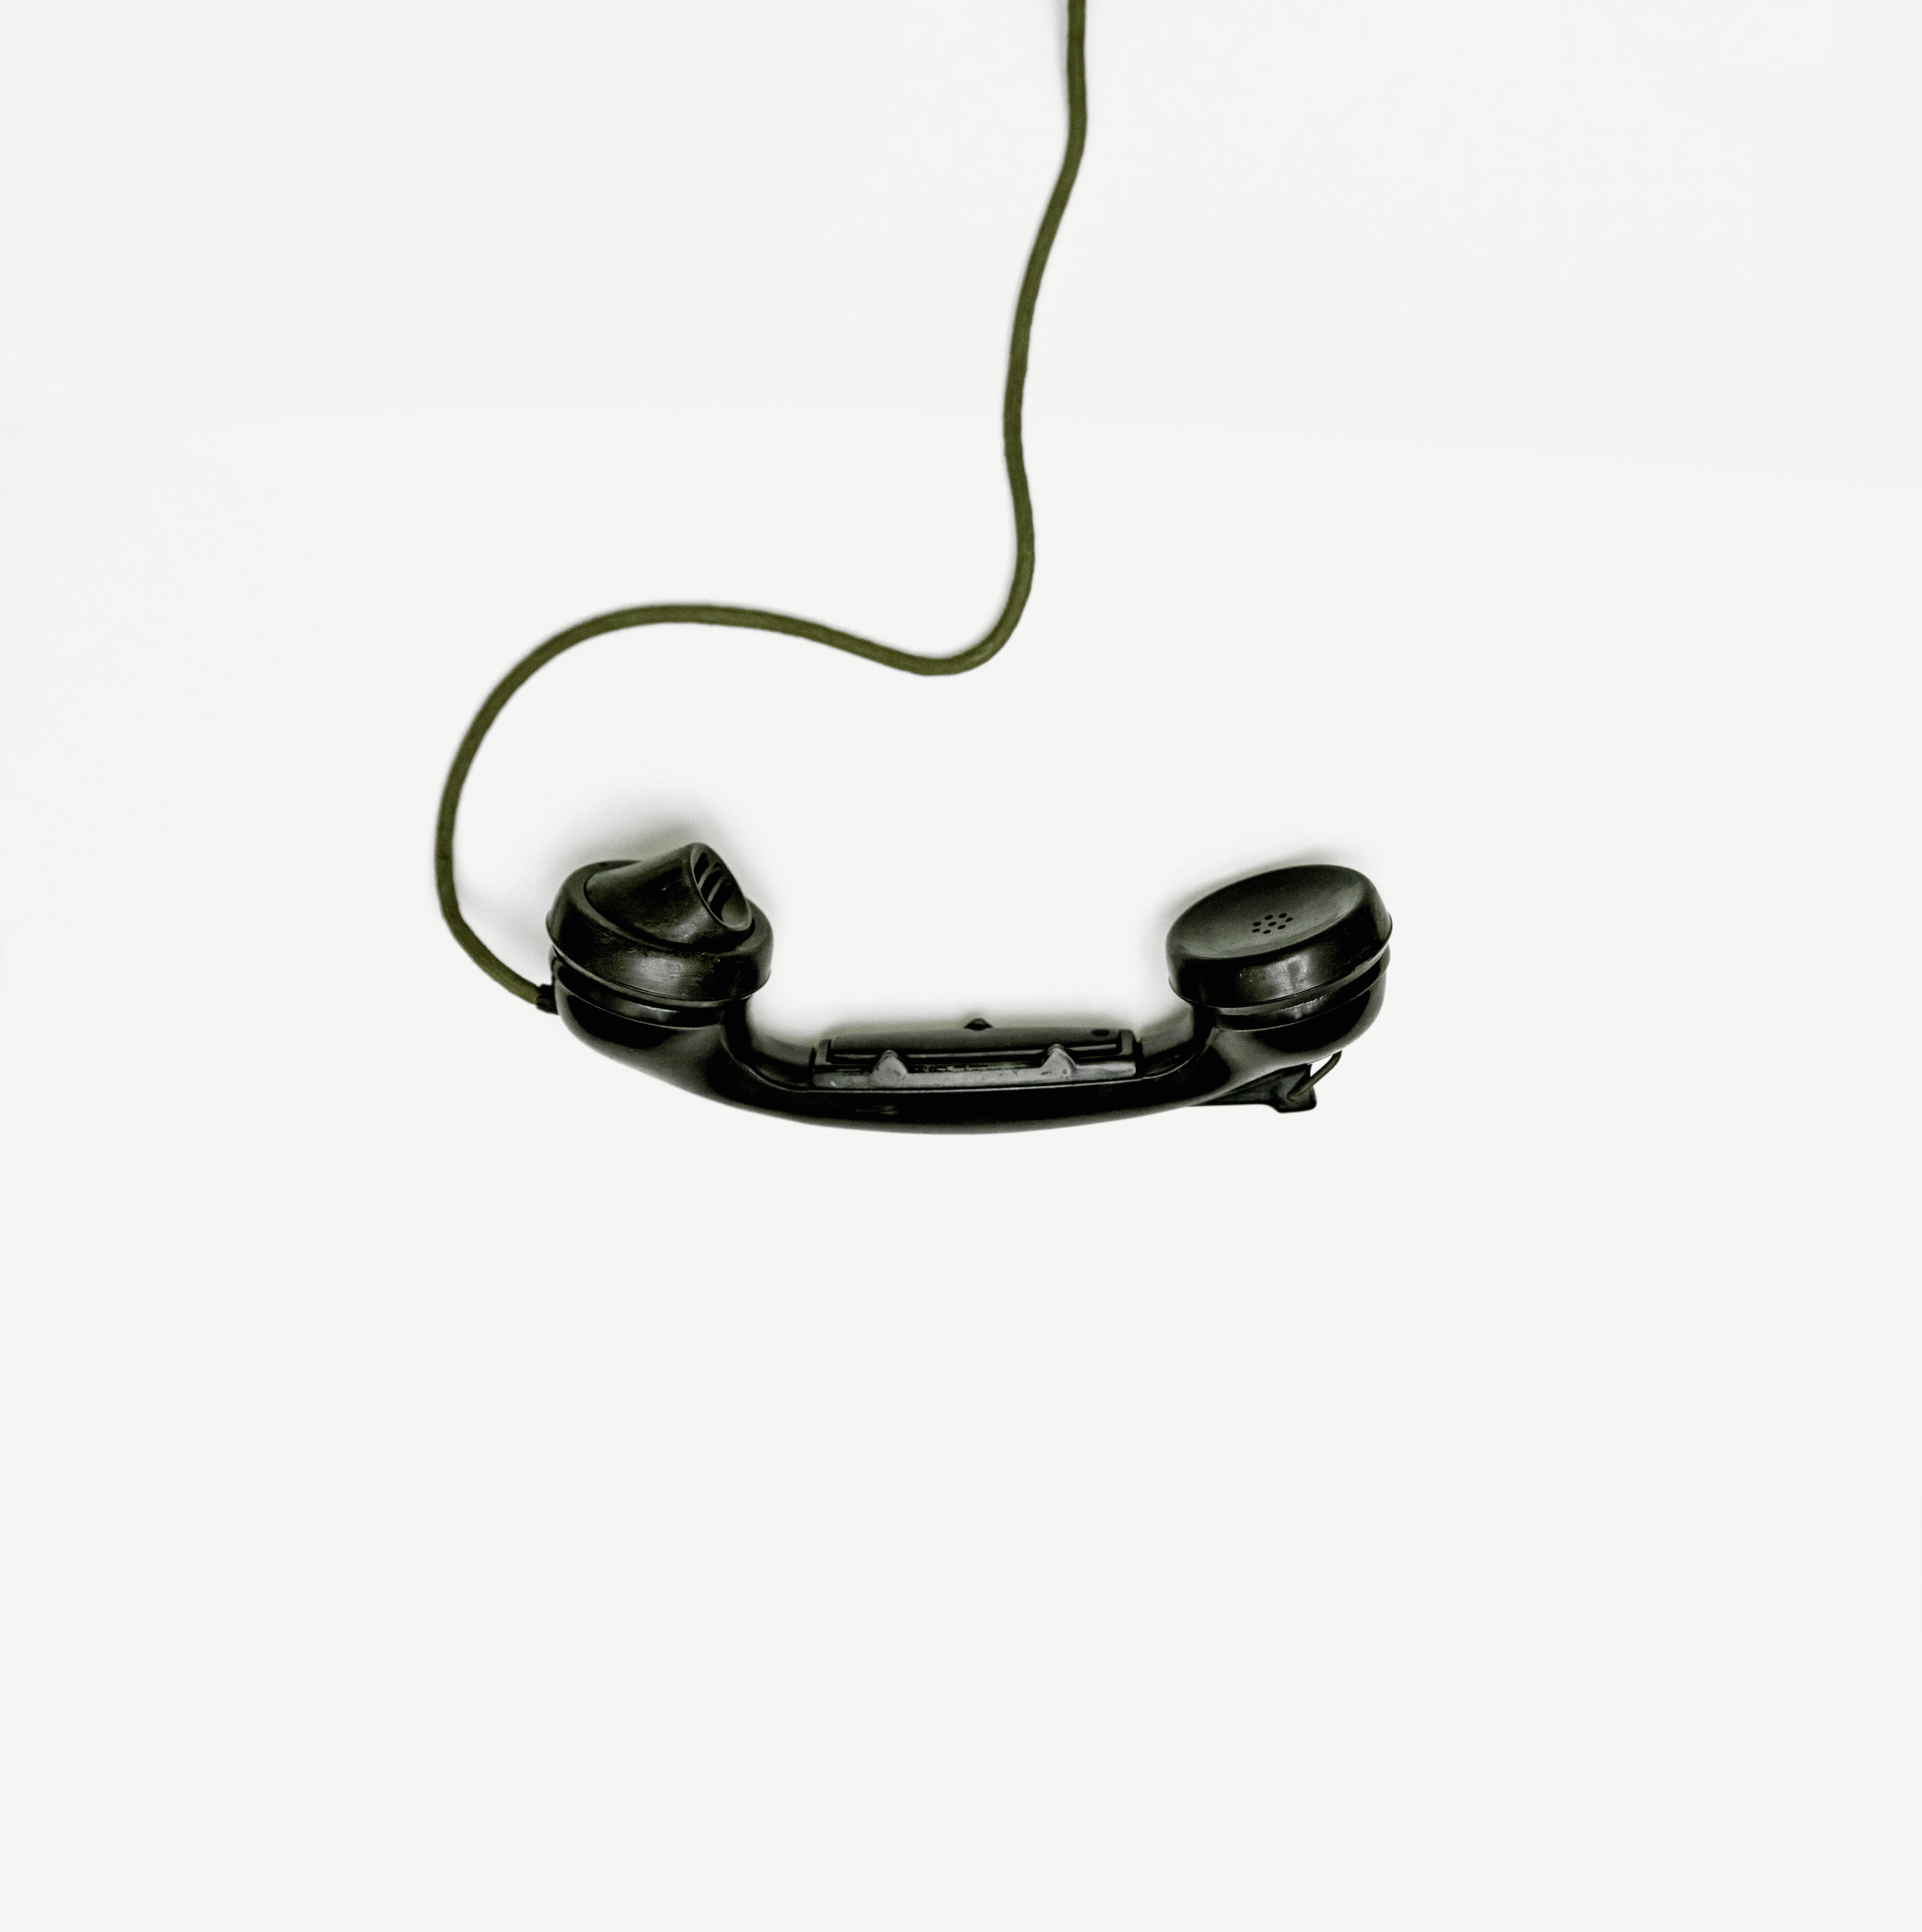 07. phone 2.1